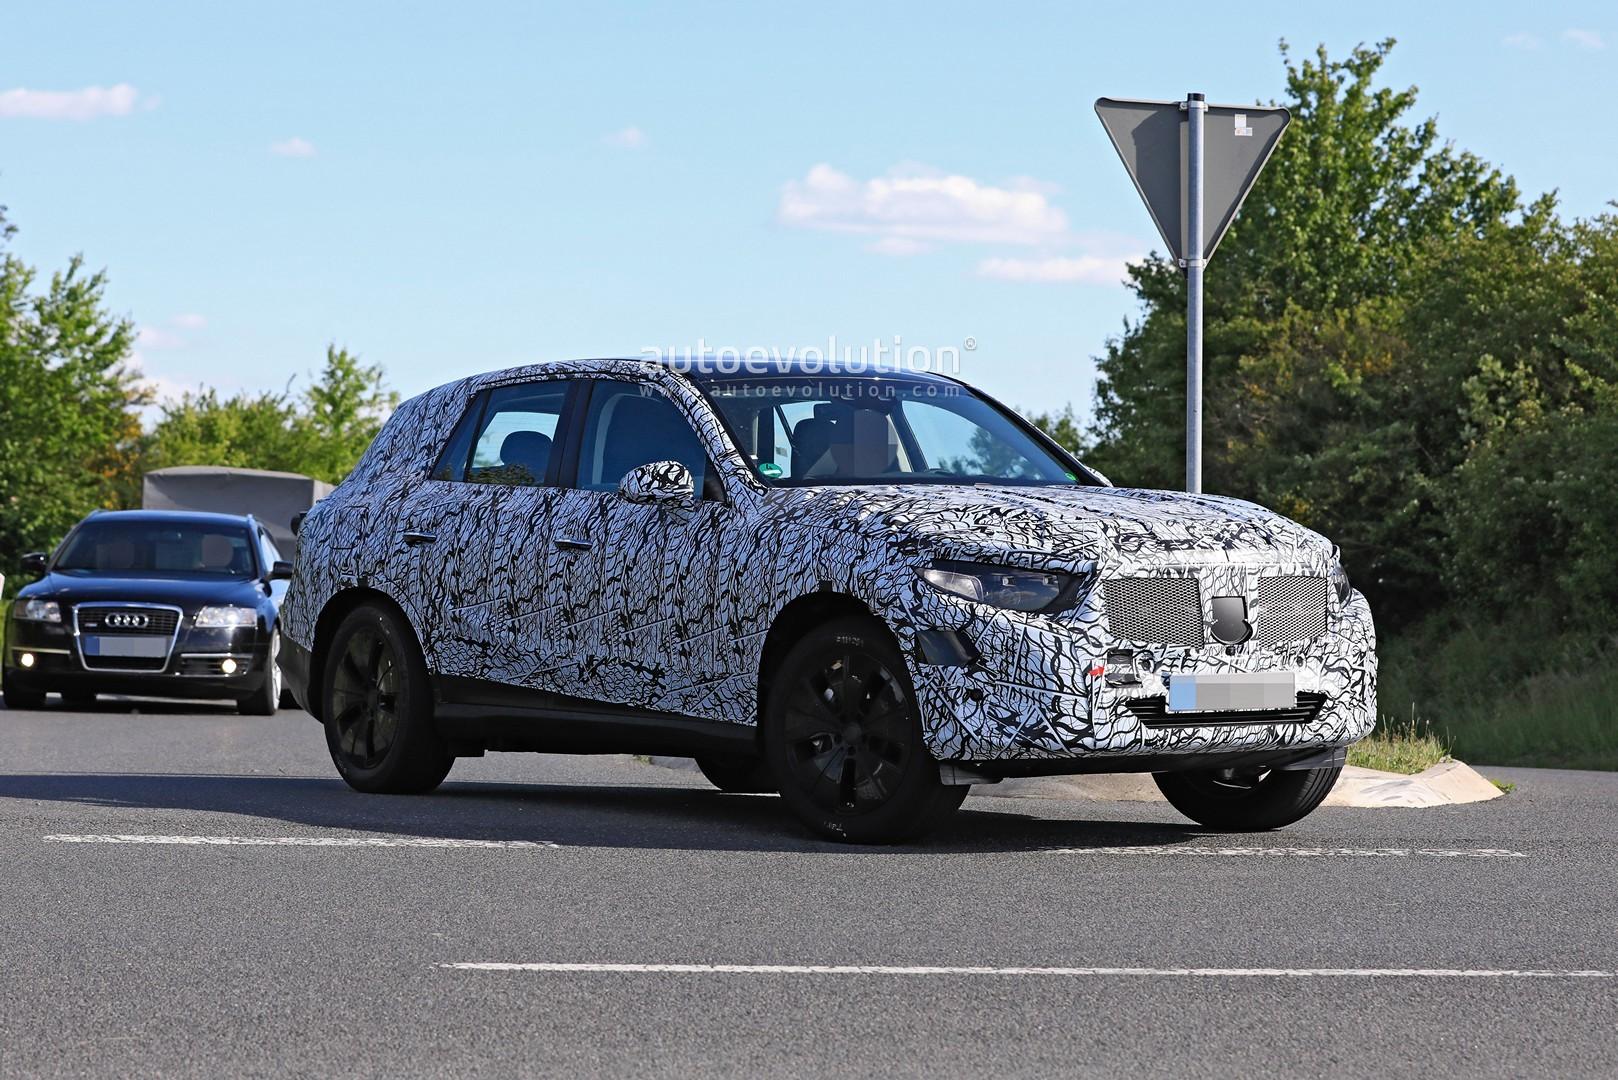 2021 - [Mercedes-Benz] GLC II 2022-mercedes-benz-glc-class-spied-up-close-looks-bigger_6